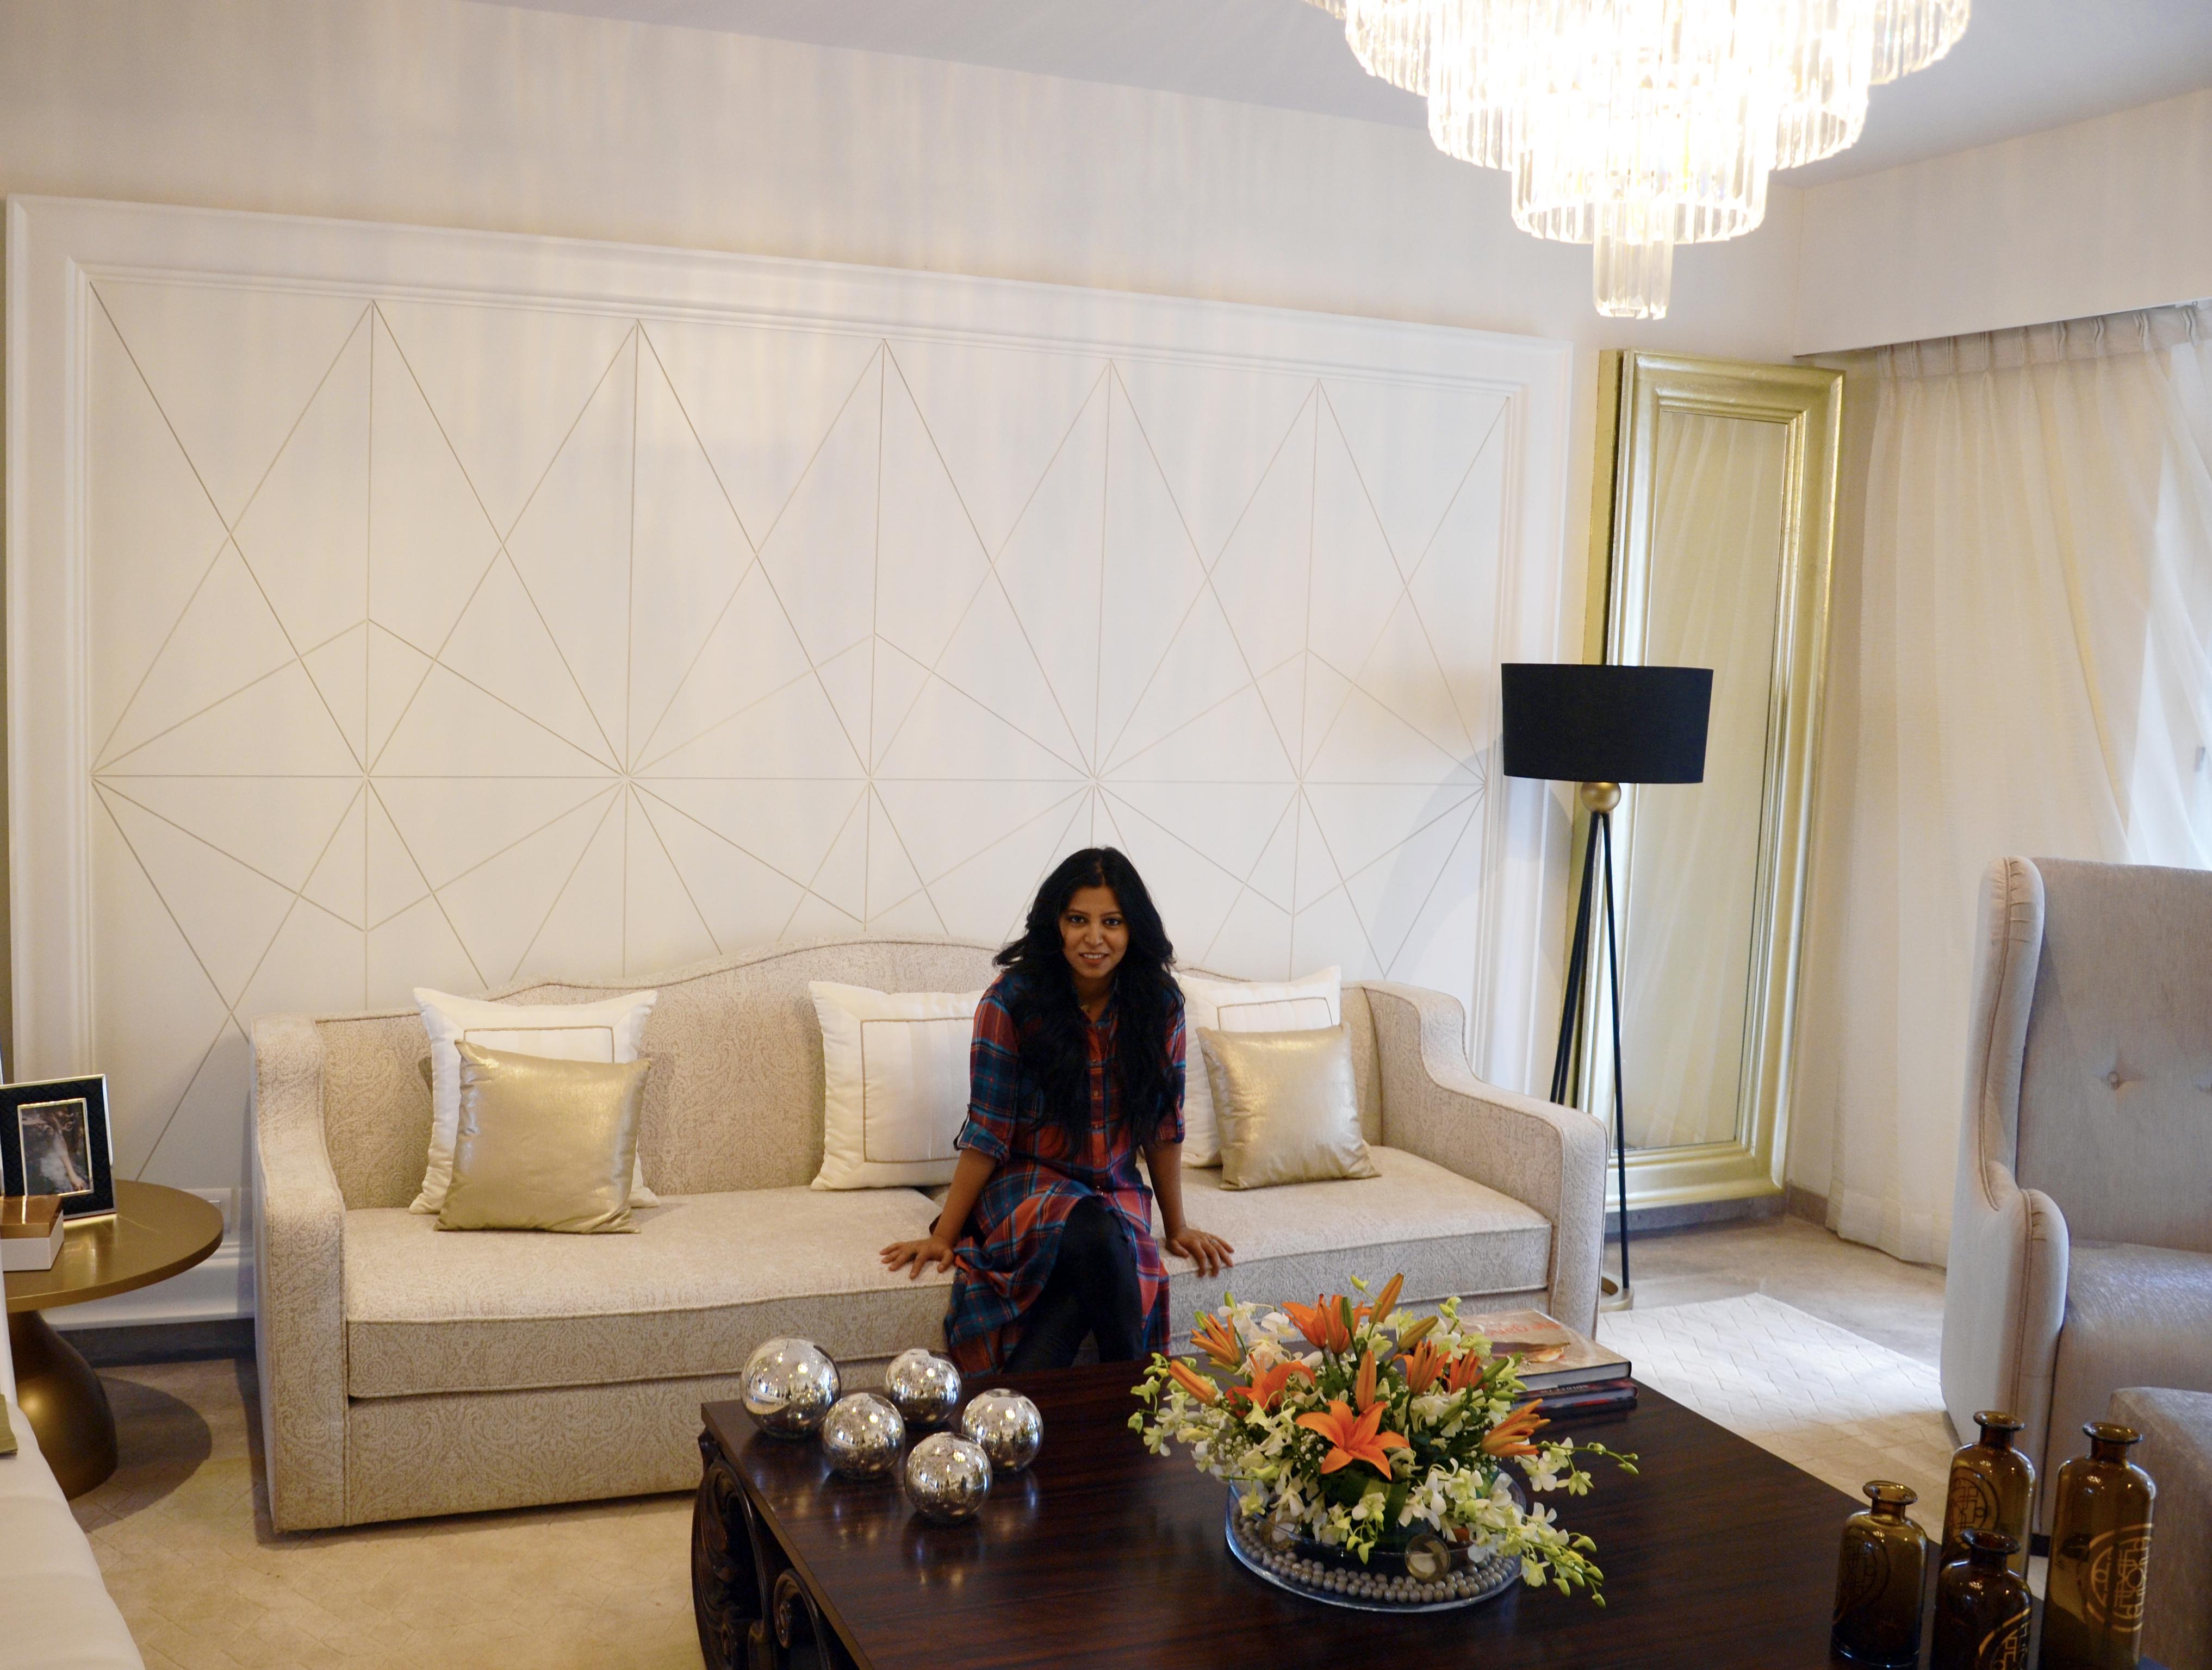 Home decor - Prestige Edwardian - Fashion and frappes